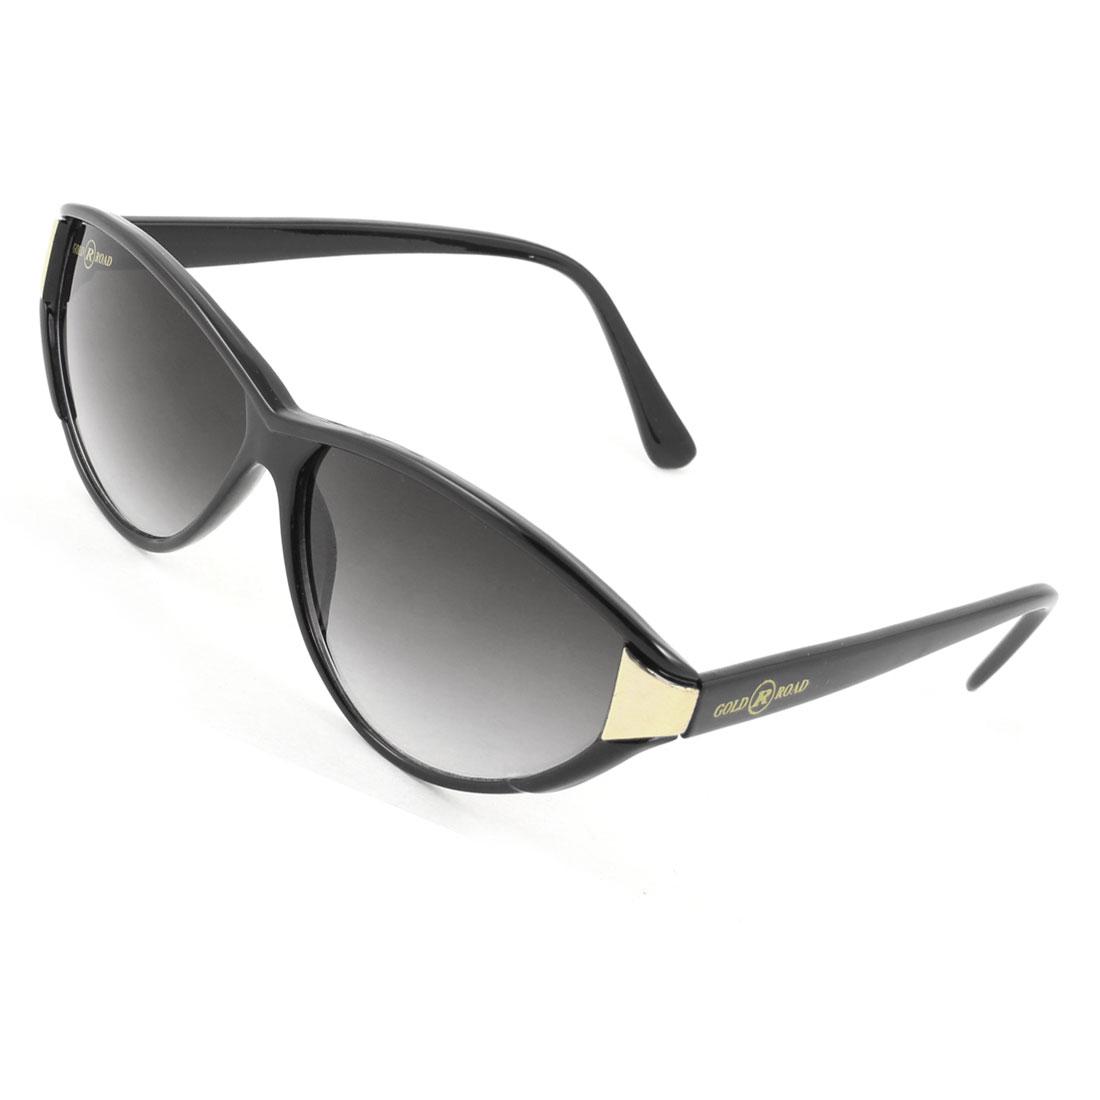 Lady Women Wayfarer Black Full Rim Protector Sunglasses Eyeglasses Glasses